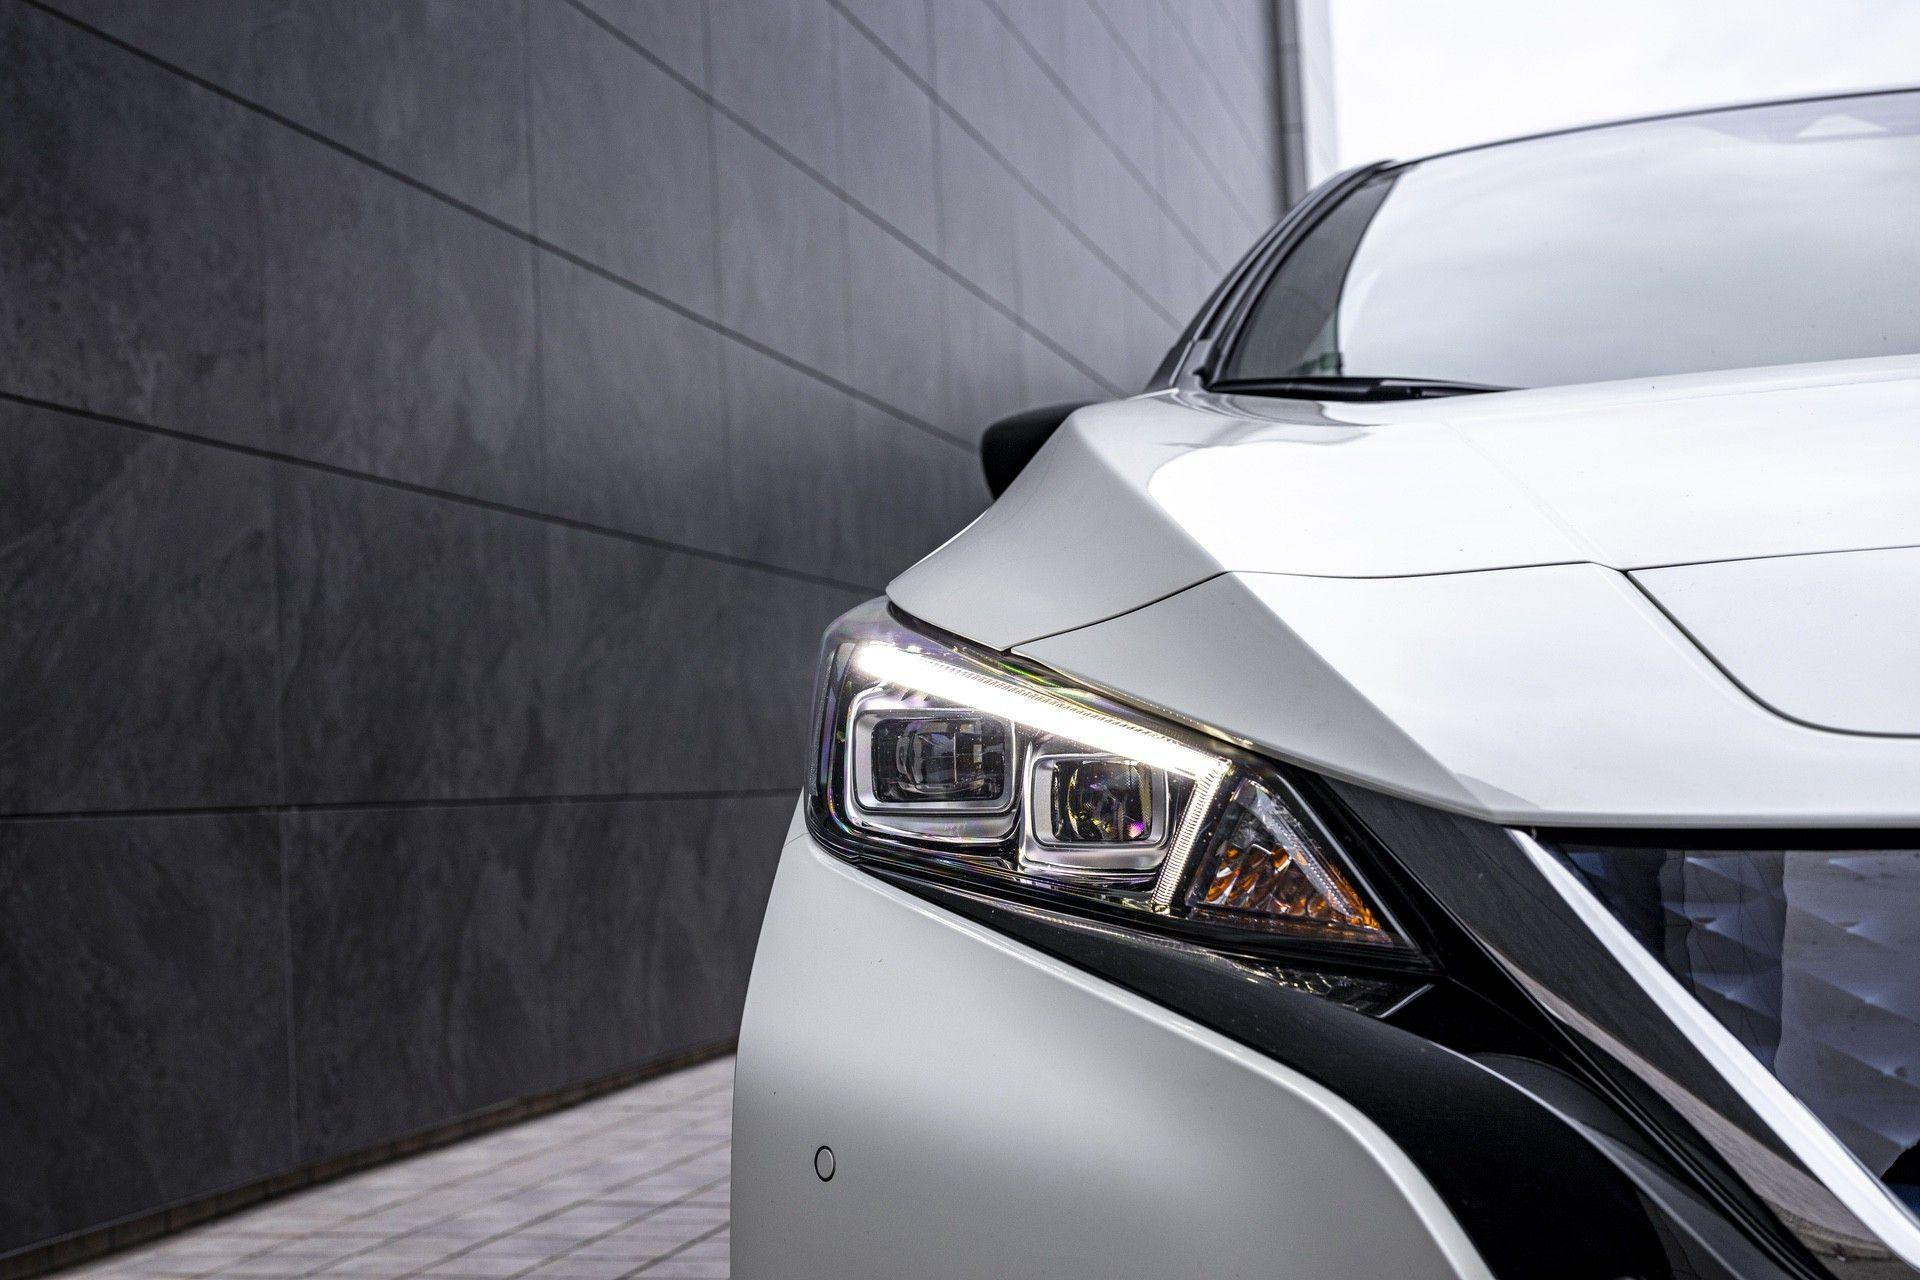 Nissan_Leaf10_special_edition-0004